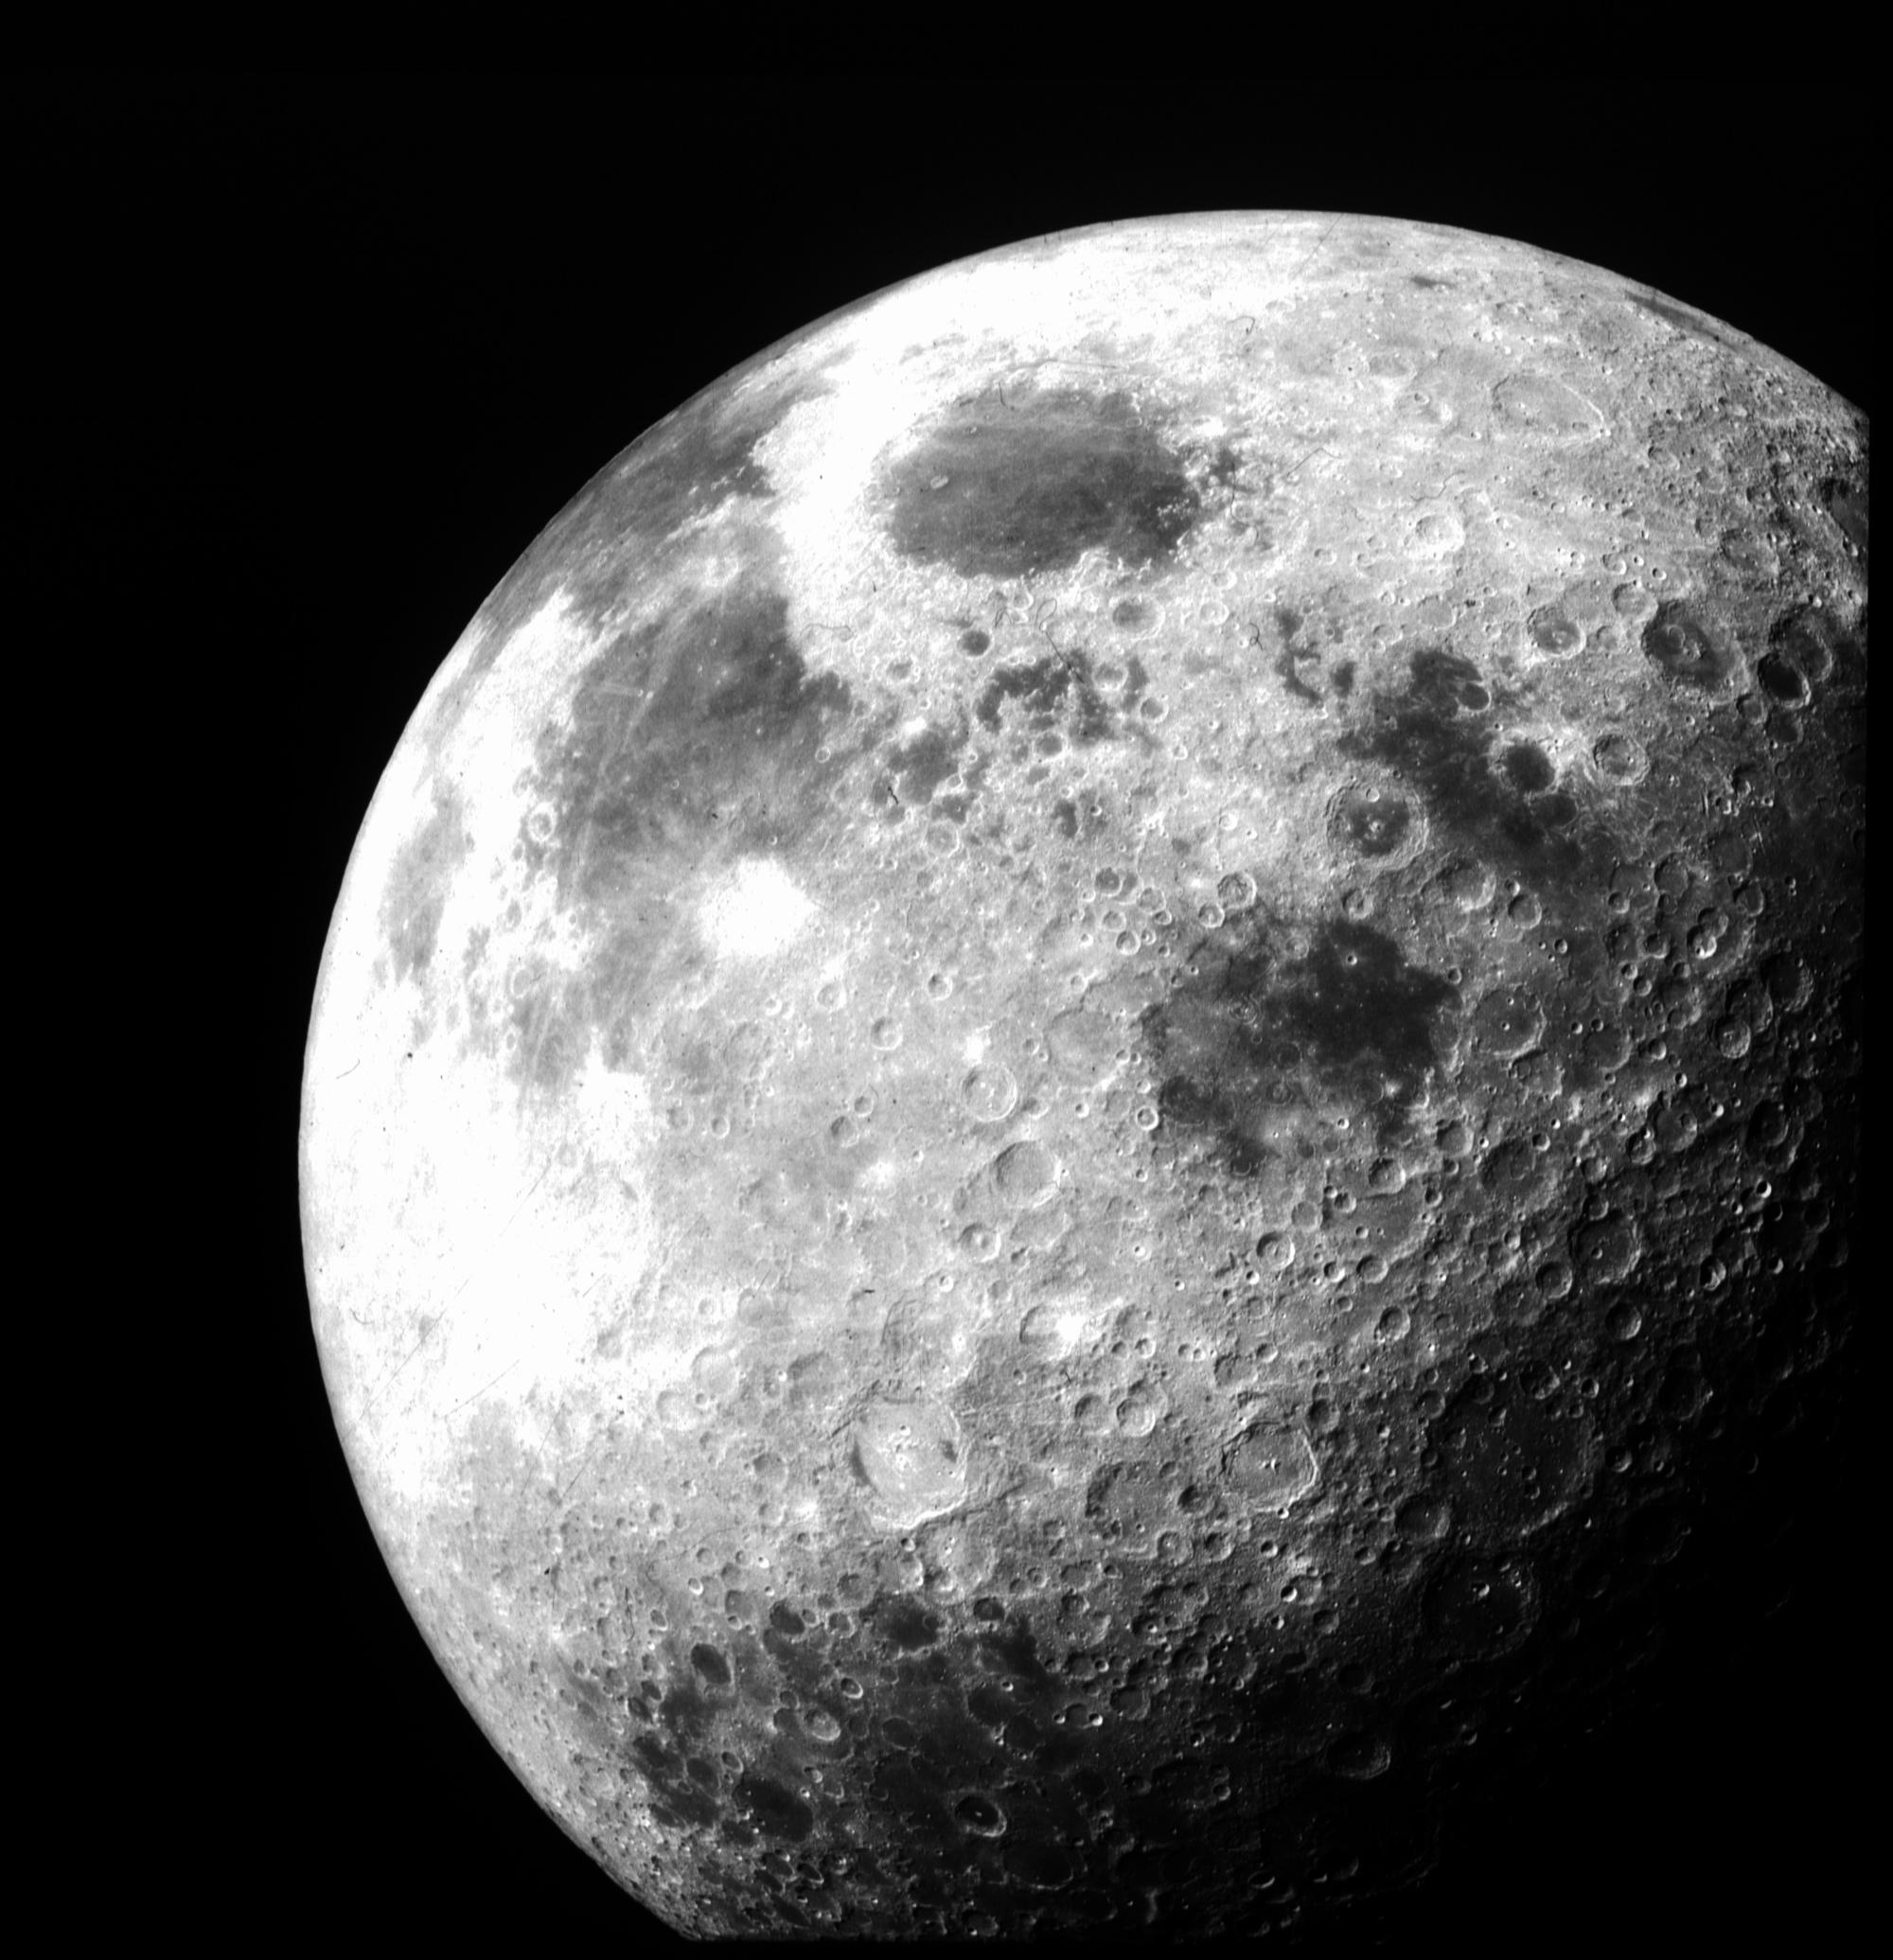 Moon from Apollo 12